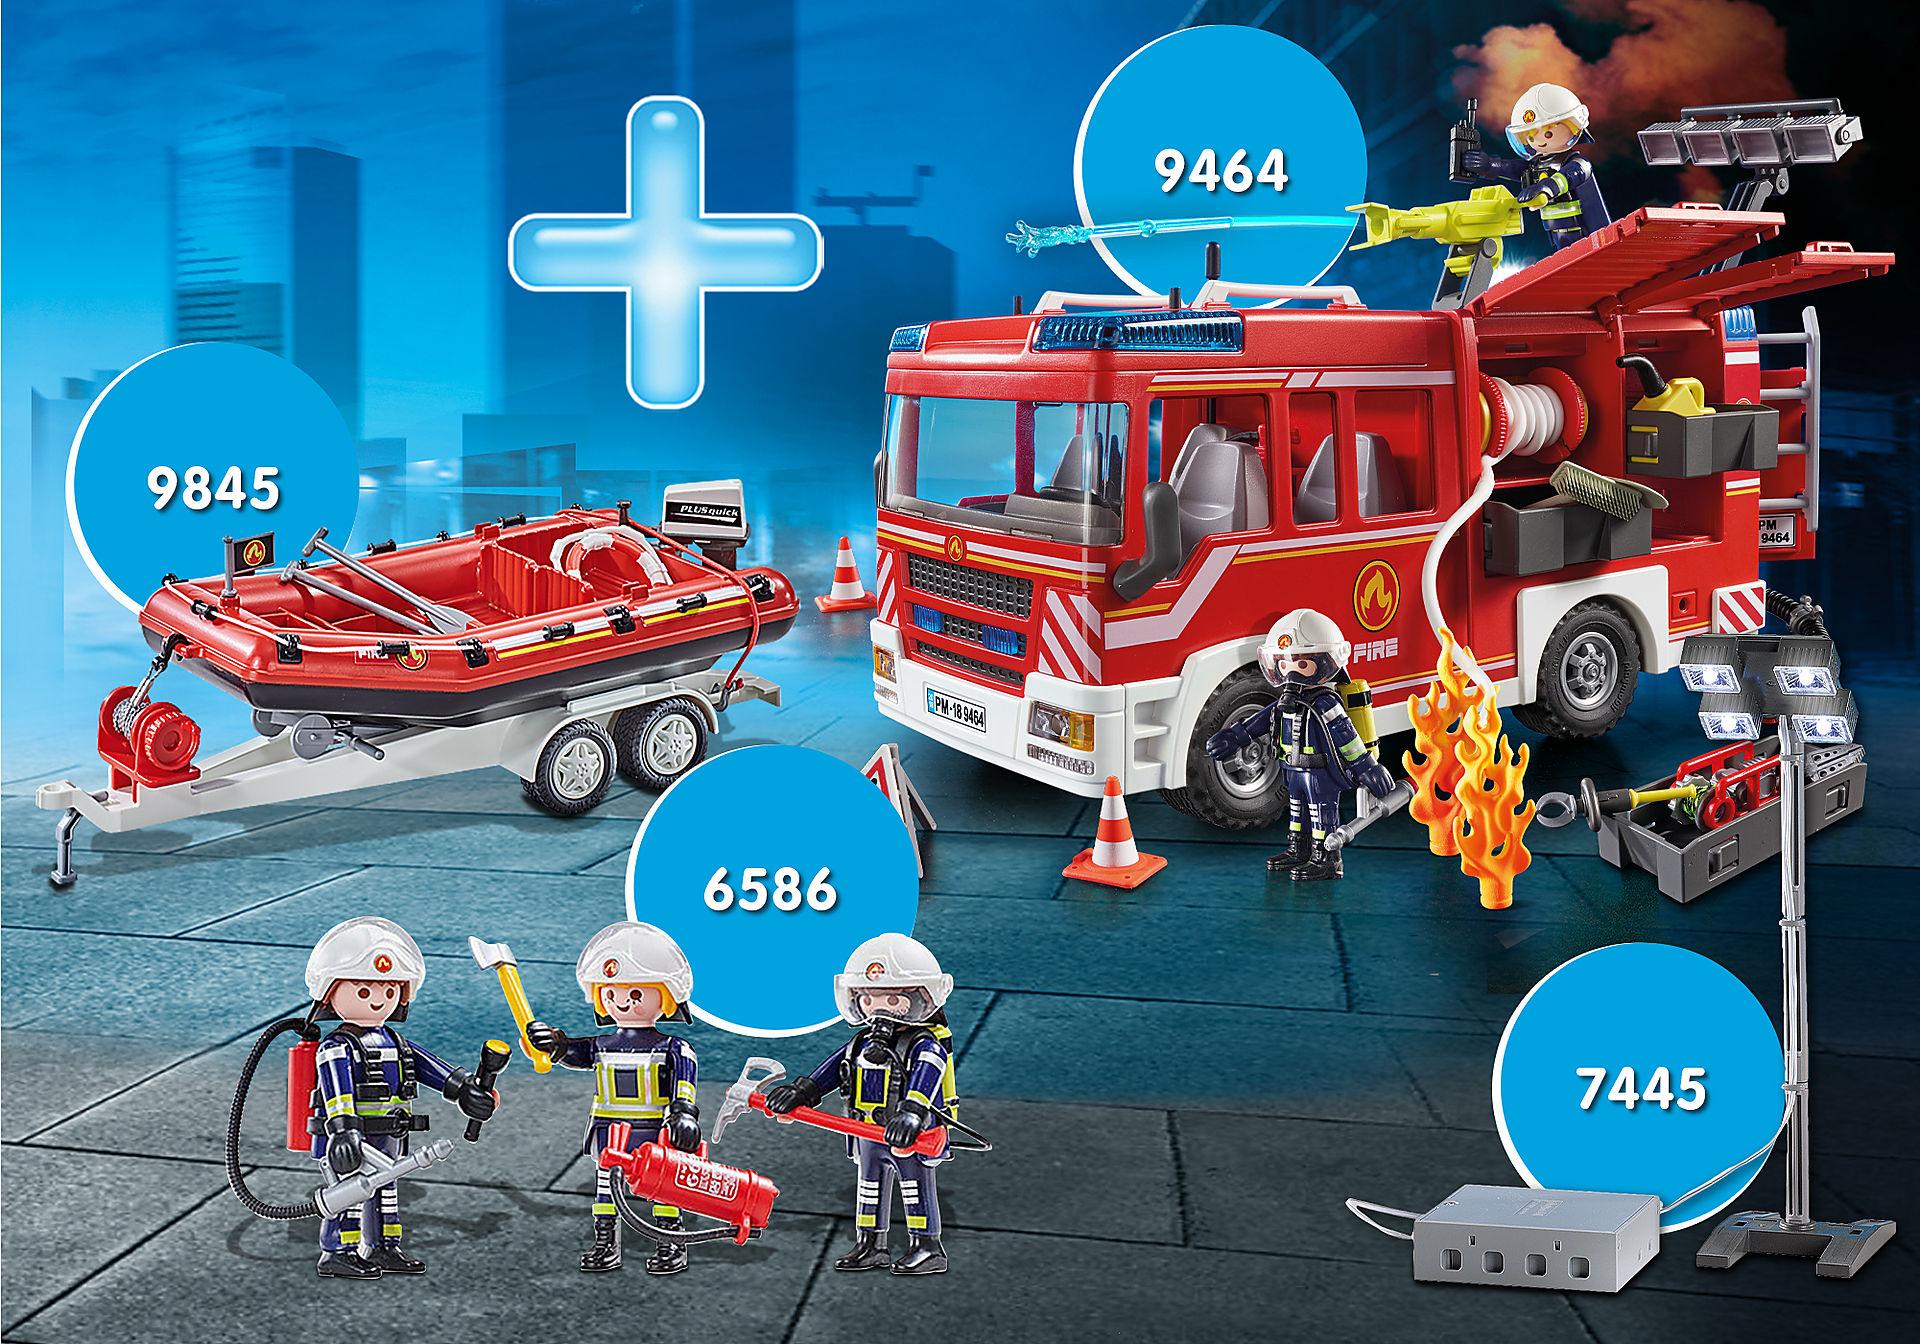 PM2014T Bundle Feuerwehr-Rüstfahrzeug zoom image1